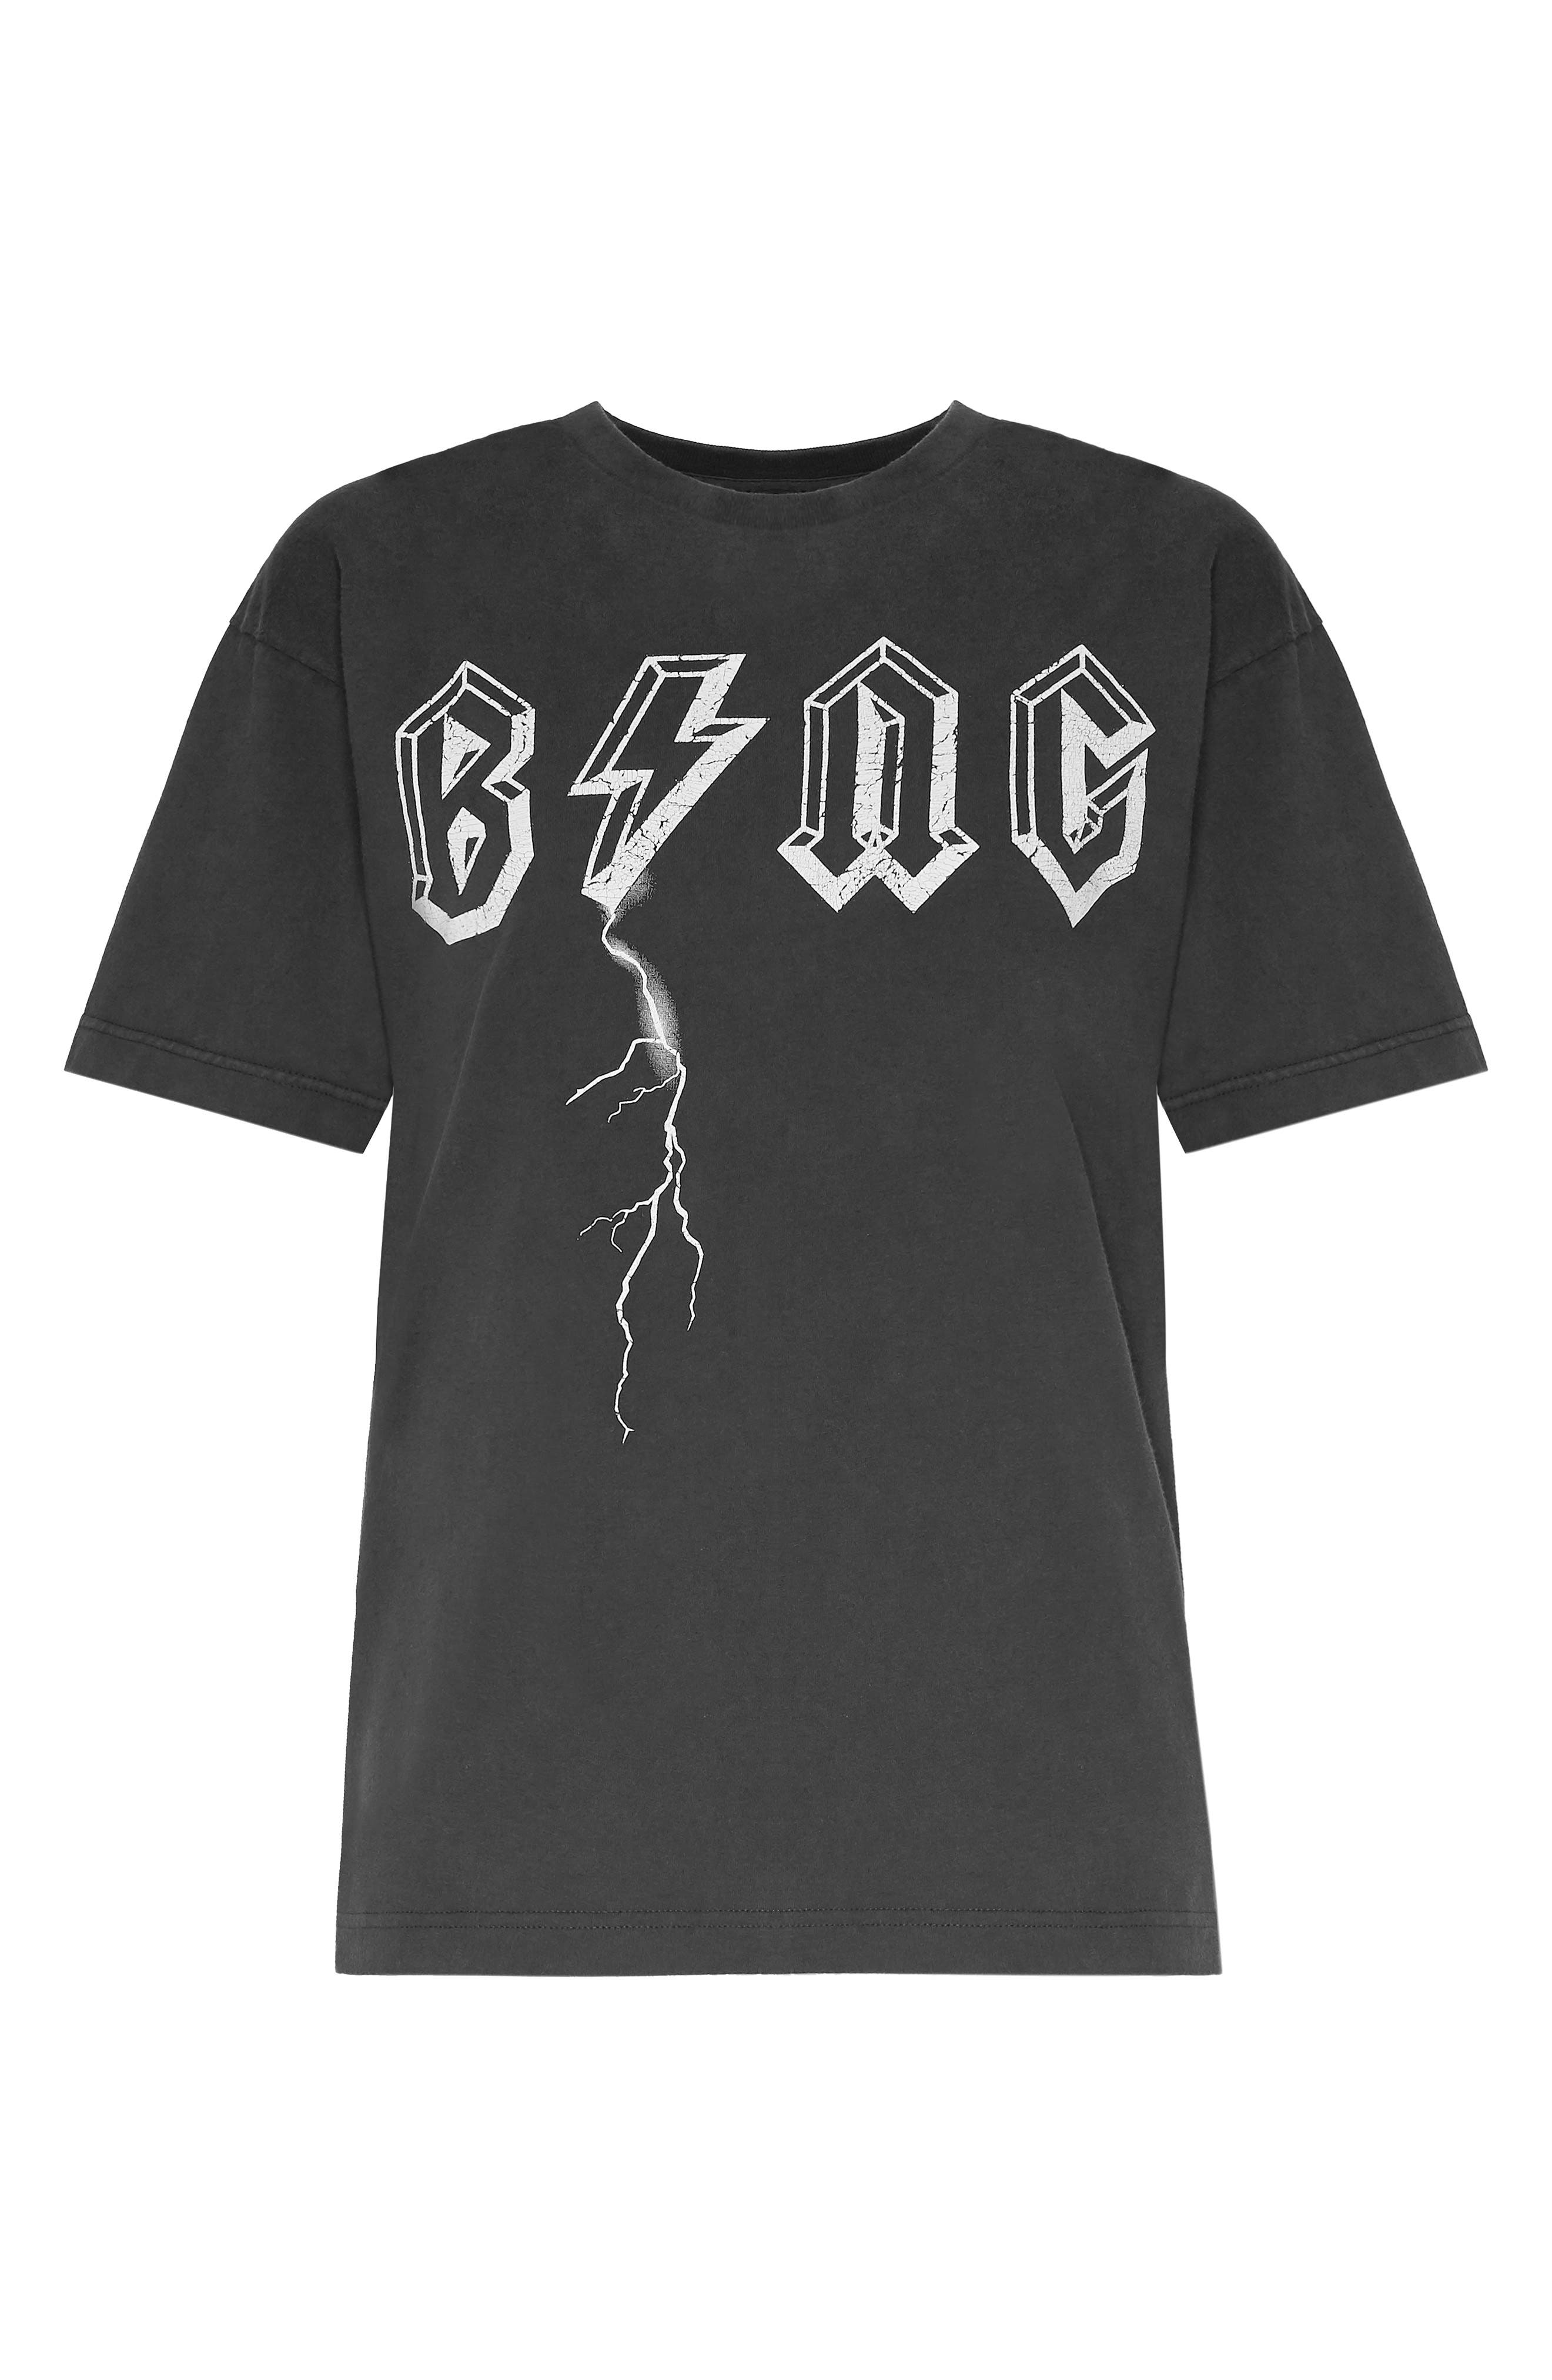 ANINE BING,                             Bing Bolt Tee,                             Alternate thumbnail 3, color,                             BLACK